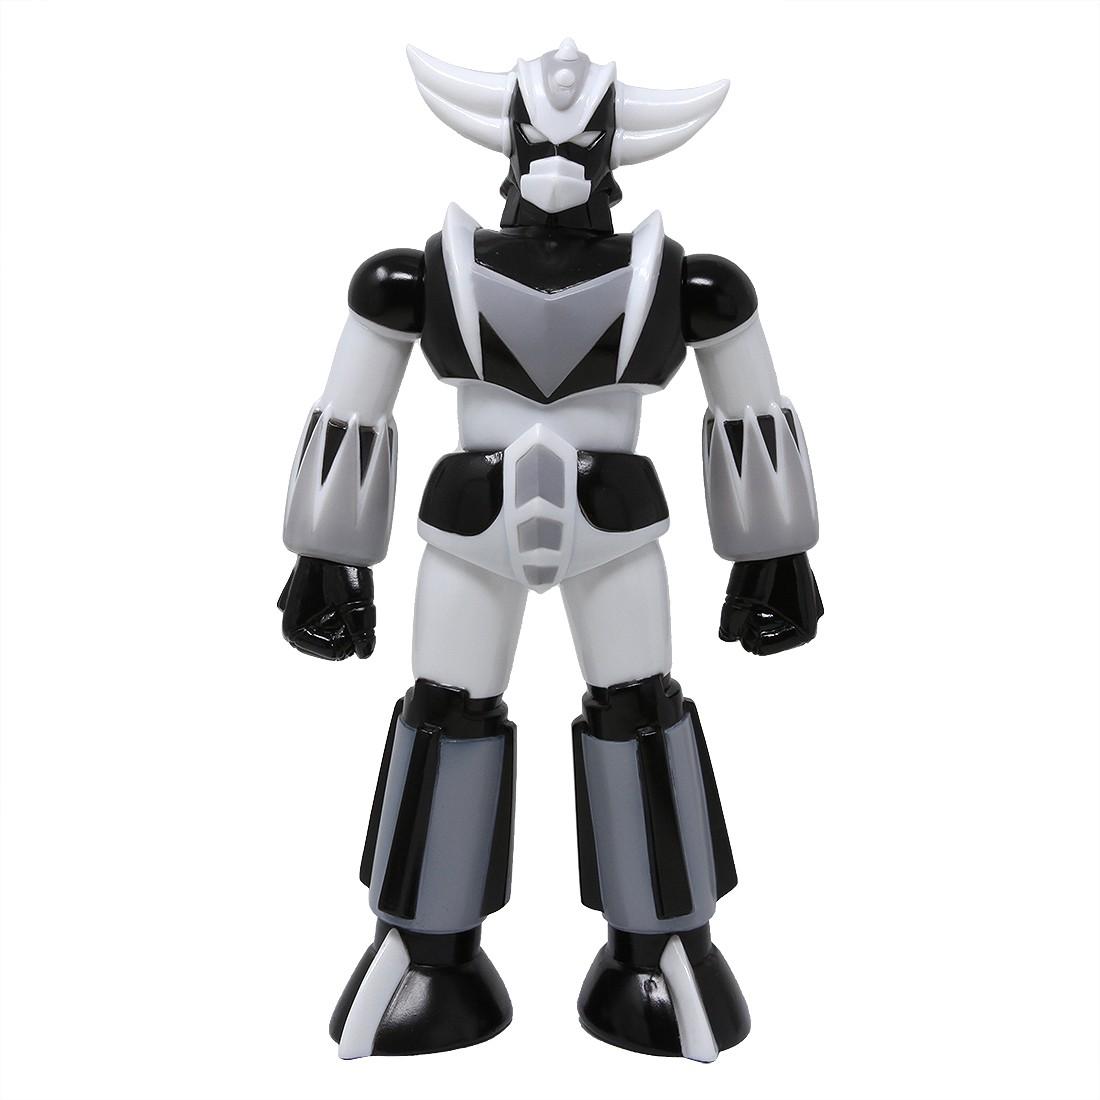 Medicom UFO Robot Grendizer Monochrome Color Ver. Sofubi Figure (black / white)